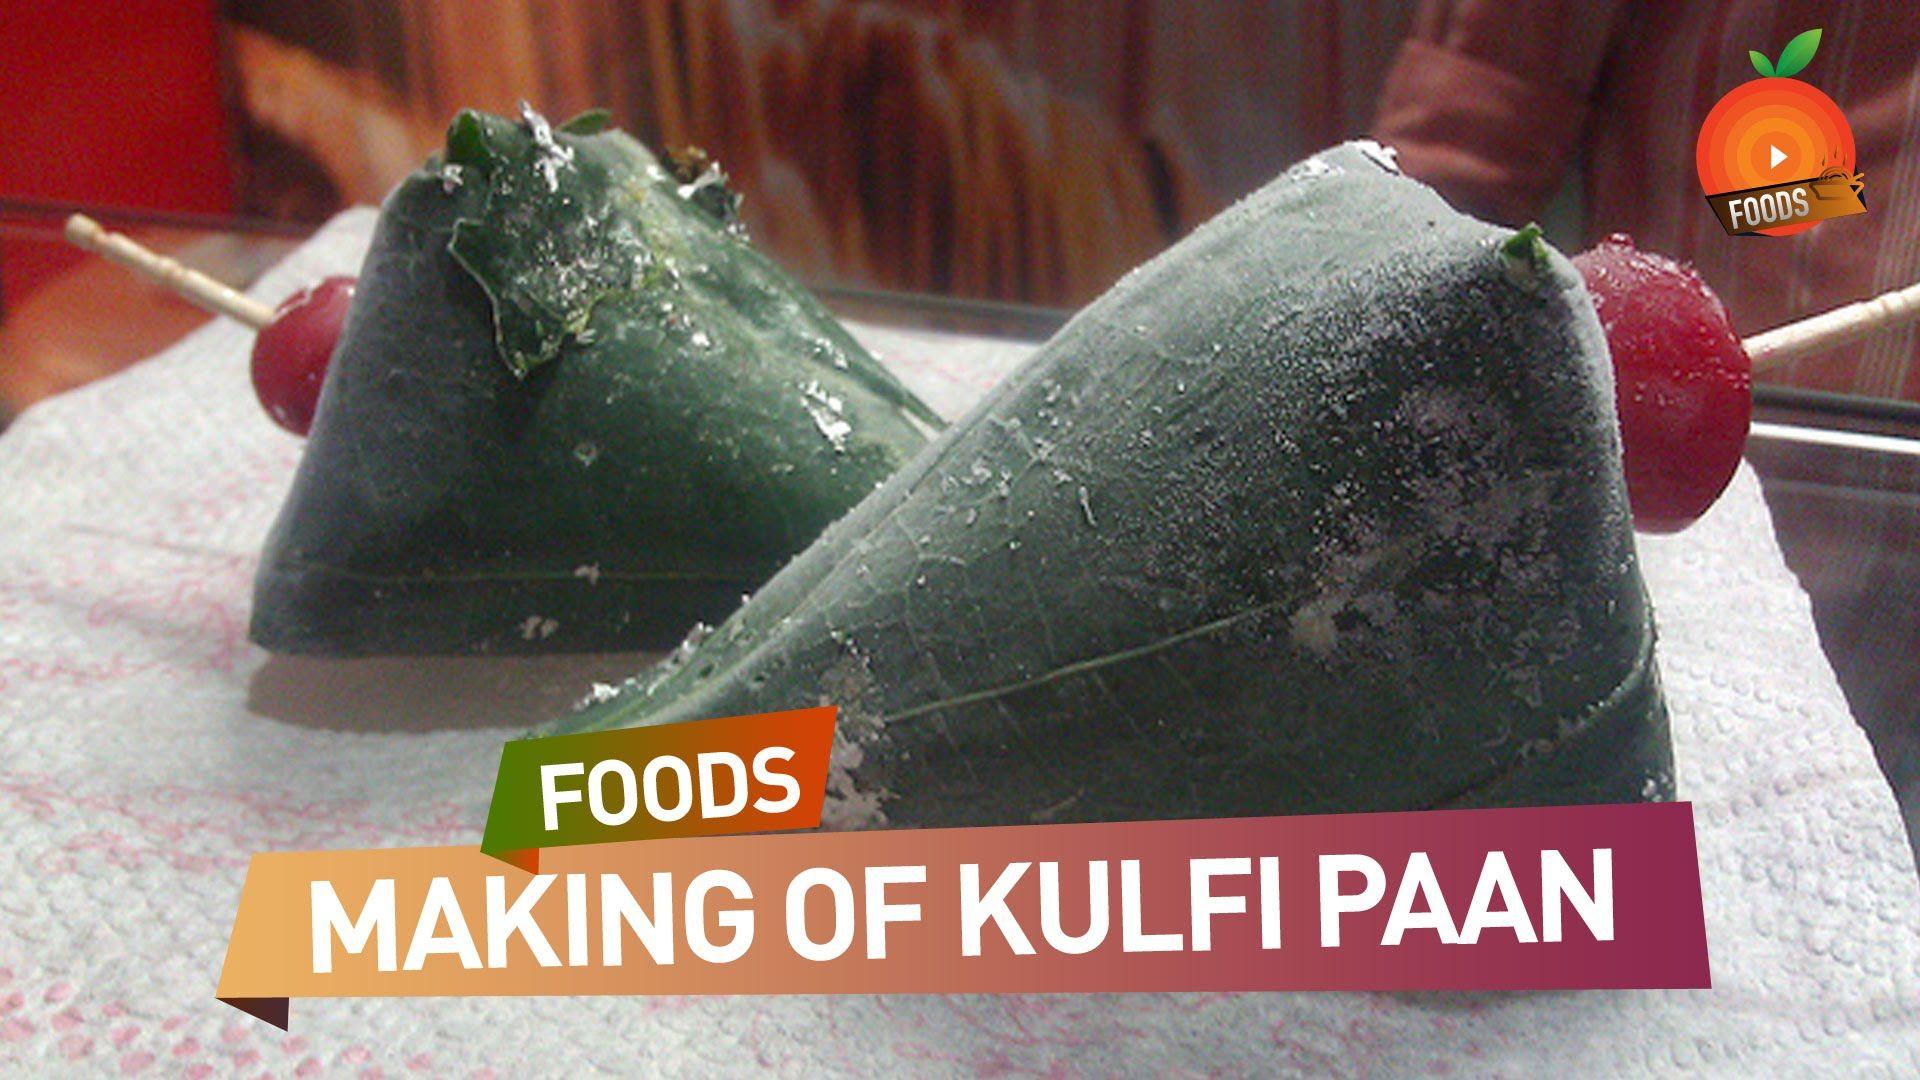 How to prepare kulfi paan indian foods ingredients used american how to prepare kulfi paan indian foods ingredients used american measuring cup forumfinder Gallery